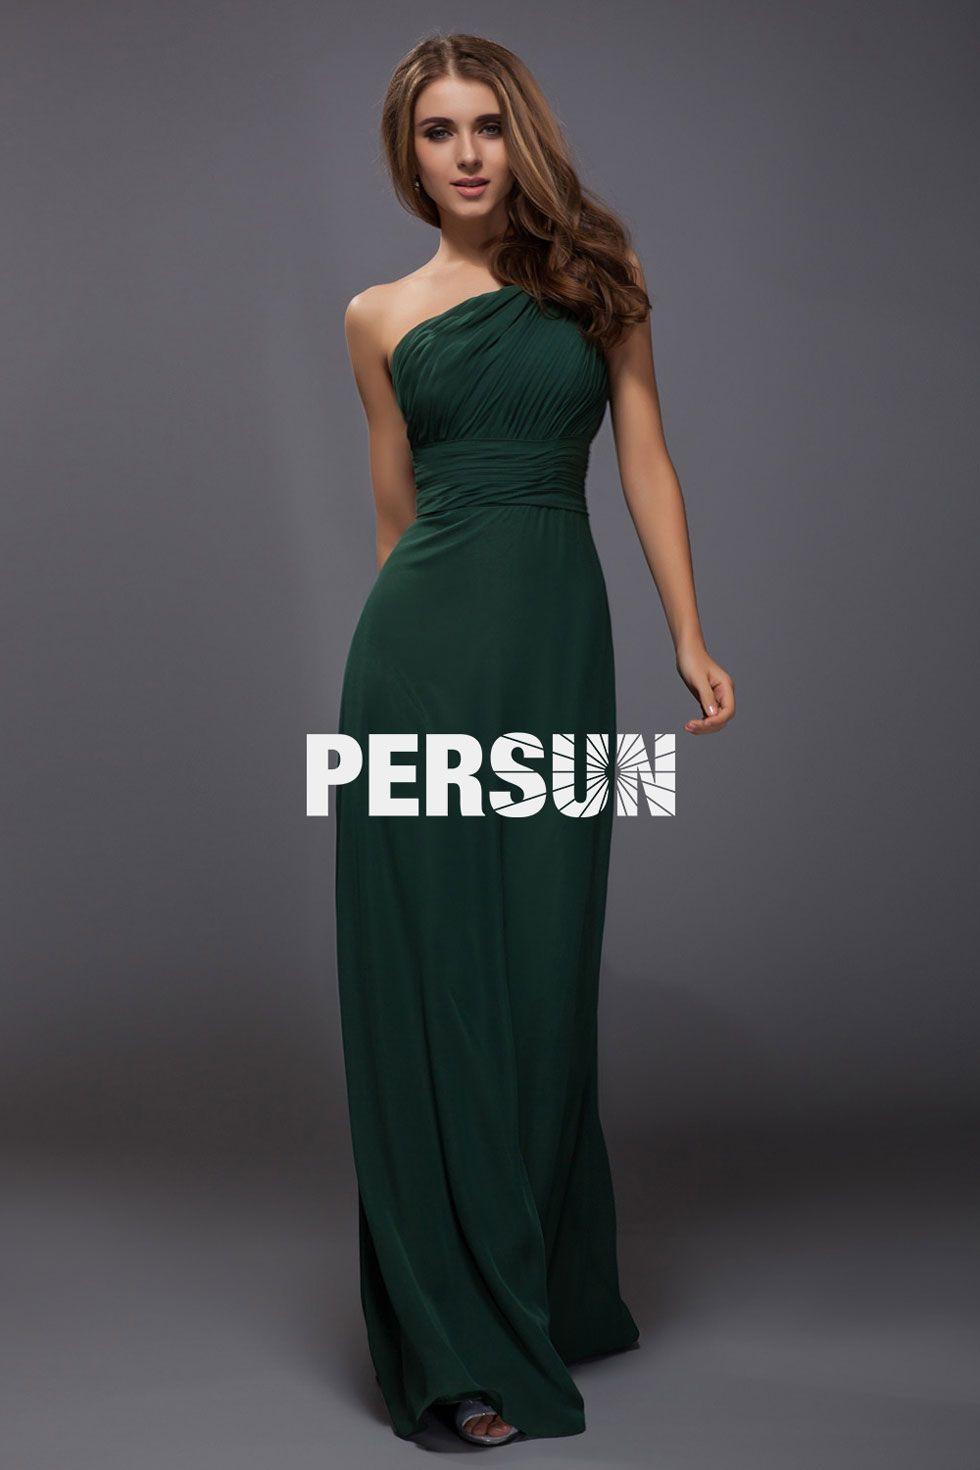 17 Großartig Abendkleid Kürzen Wie Lang SpezialgebietAbend Einfach Abendkleid Kürzen Wie Lang Vertrieb